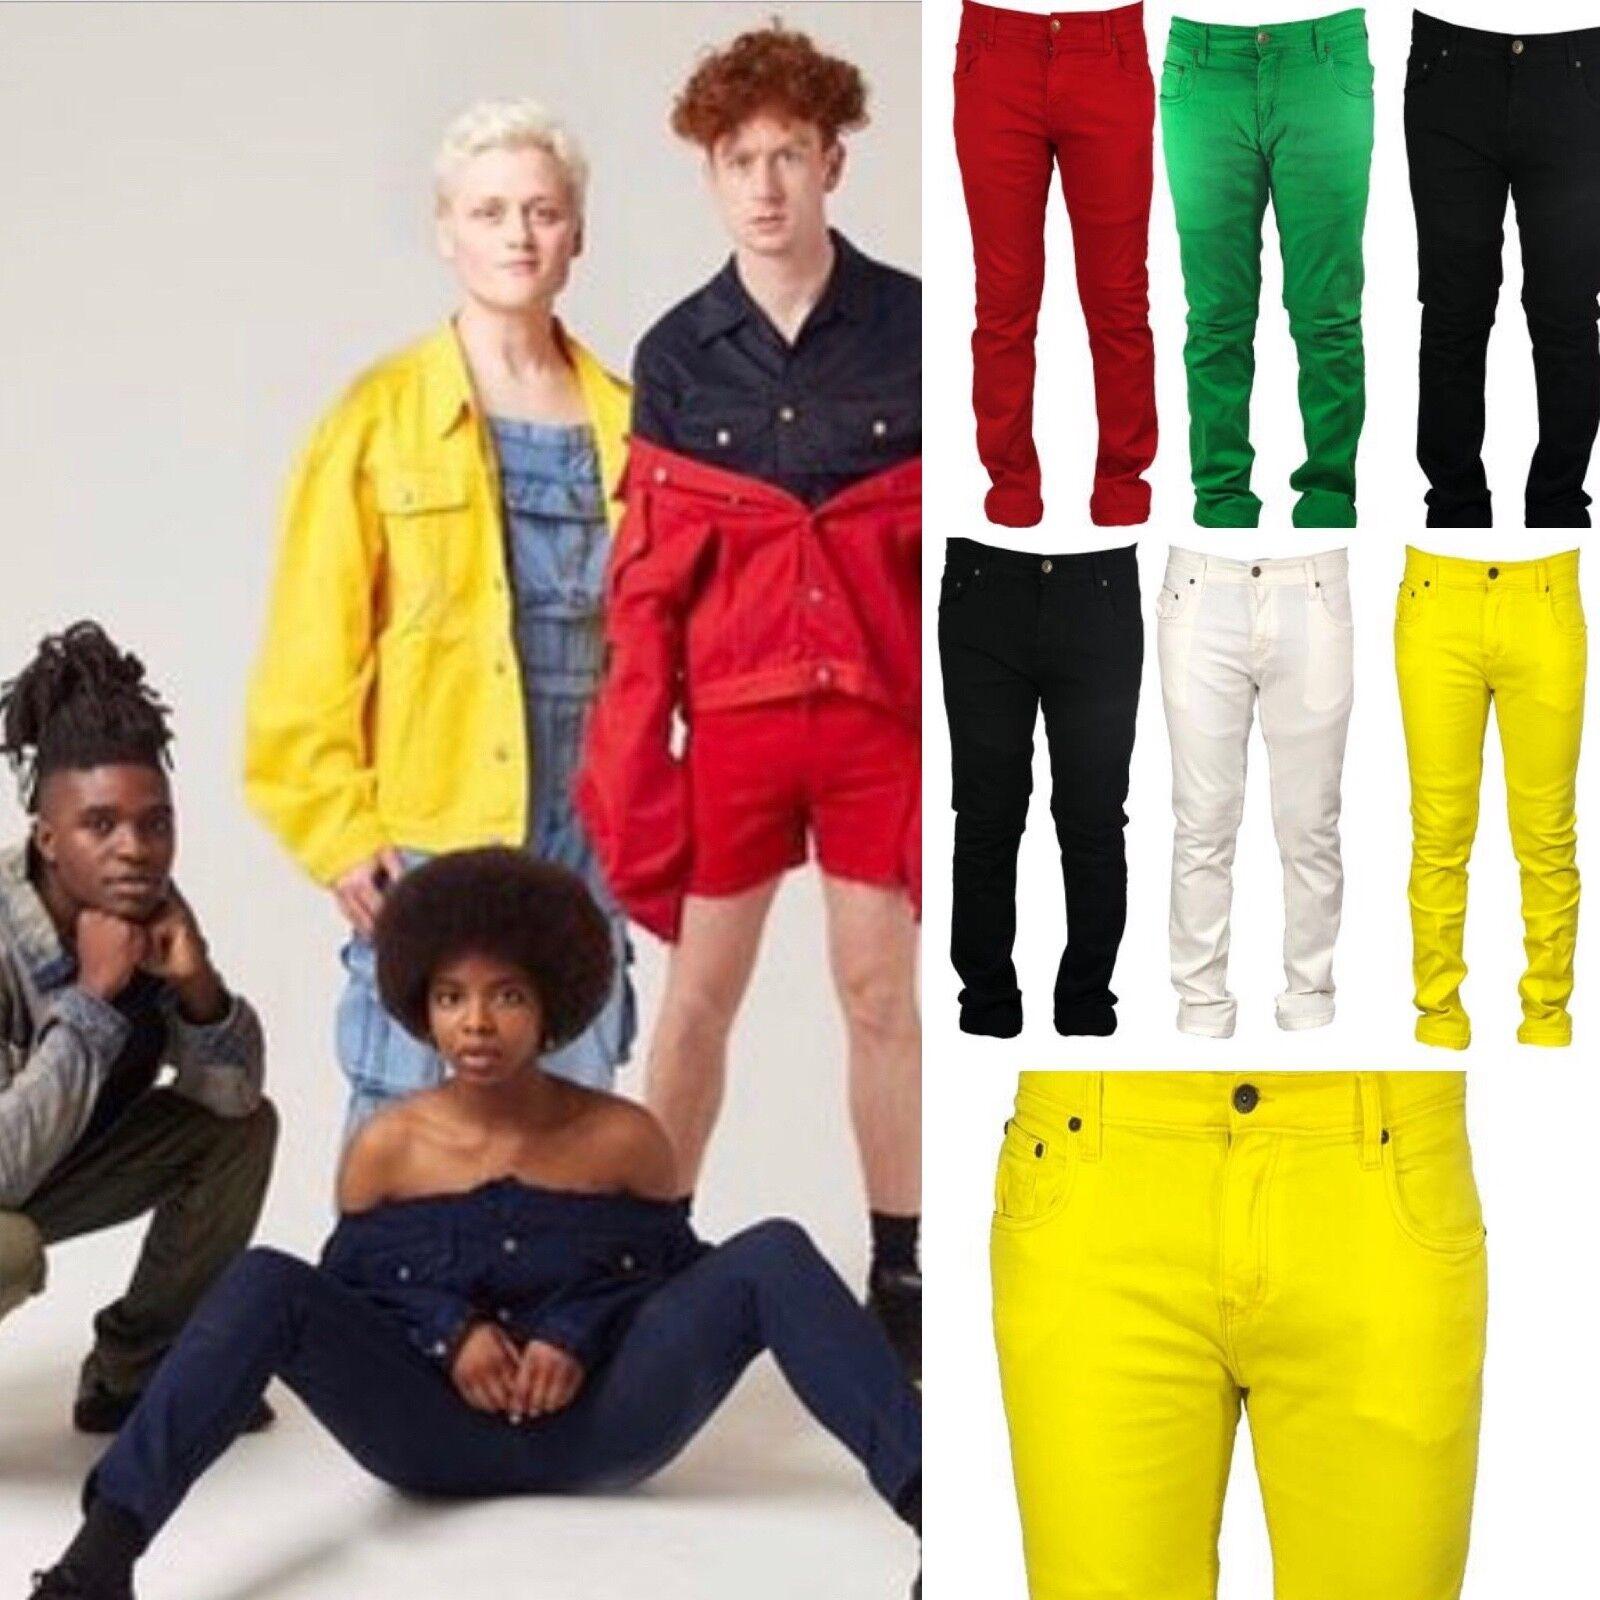 Georgio Peviani Dritto Jeans Stretch, Vice Pantaloni Denim, @ Paris Paris Paris Fashion Week 53e6b6